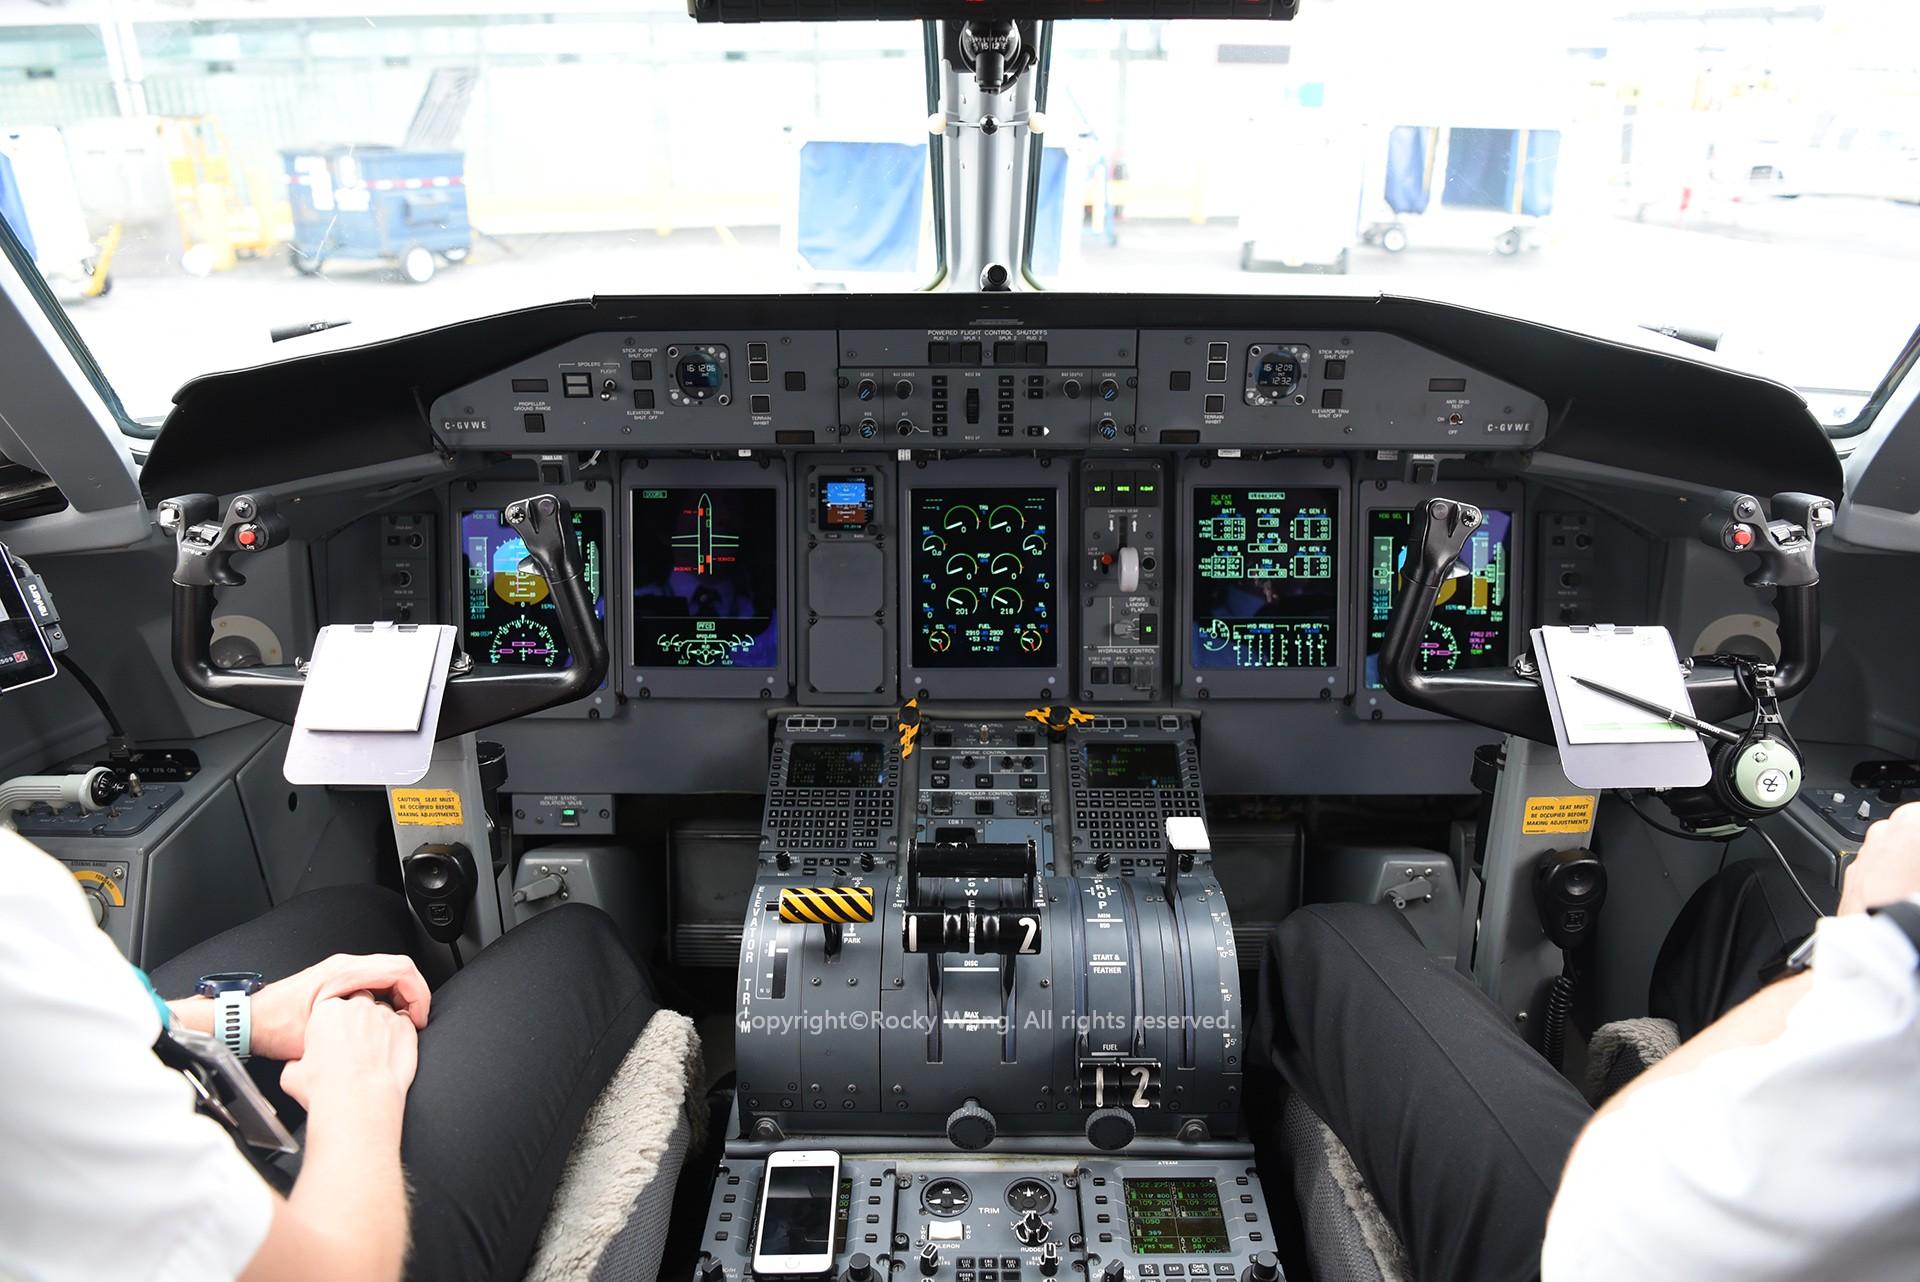 Re:[原创]简易版游记,纪念一次30段的环球飞行和一些碎碎念 BOMBARDIER DASH 8-Q402 C-GVWE Toronto Lester B. Pearson Int'l Airport